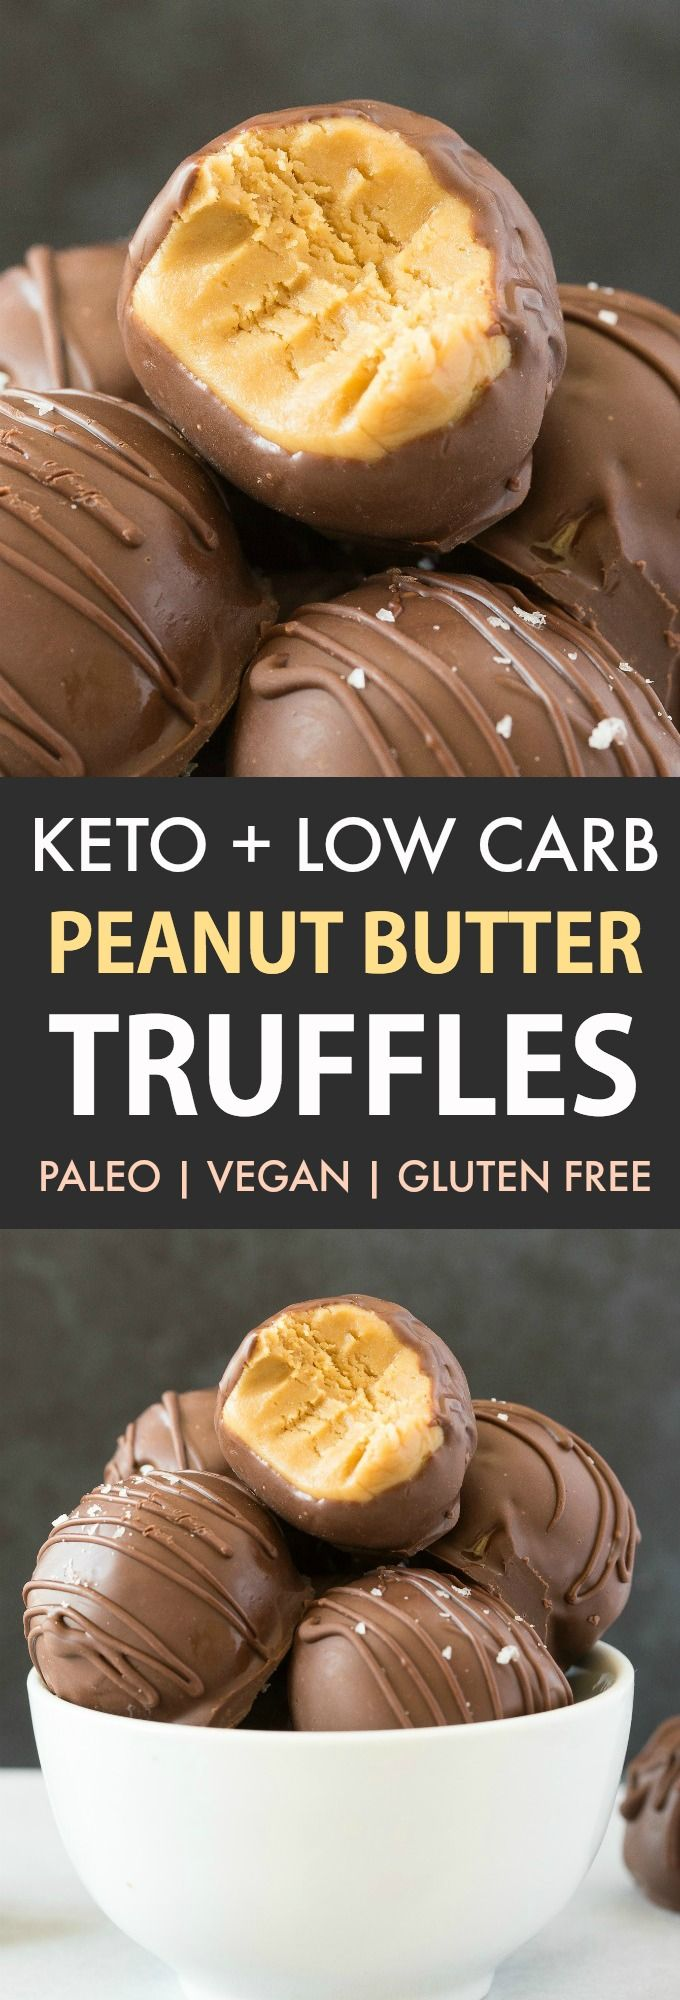 These Keto Peanut Butter Truffles are ADDICTIVE! 4…